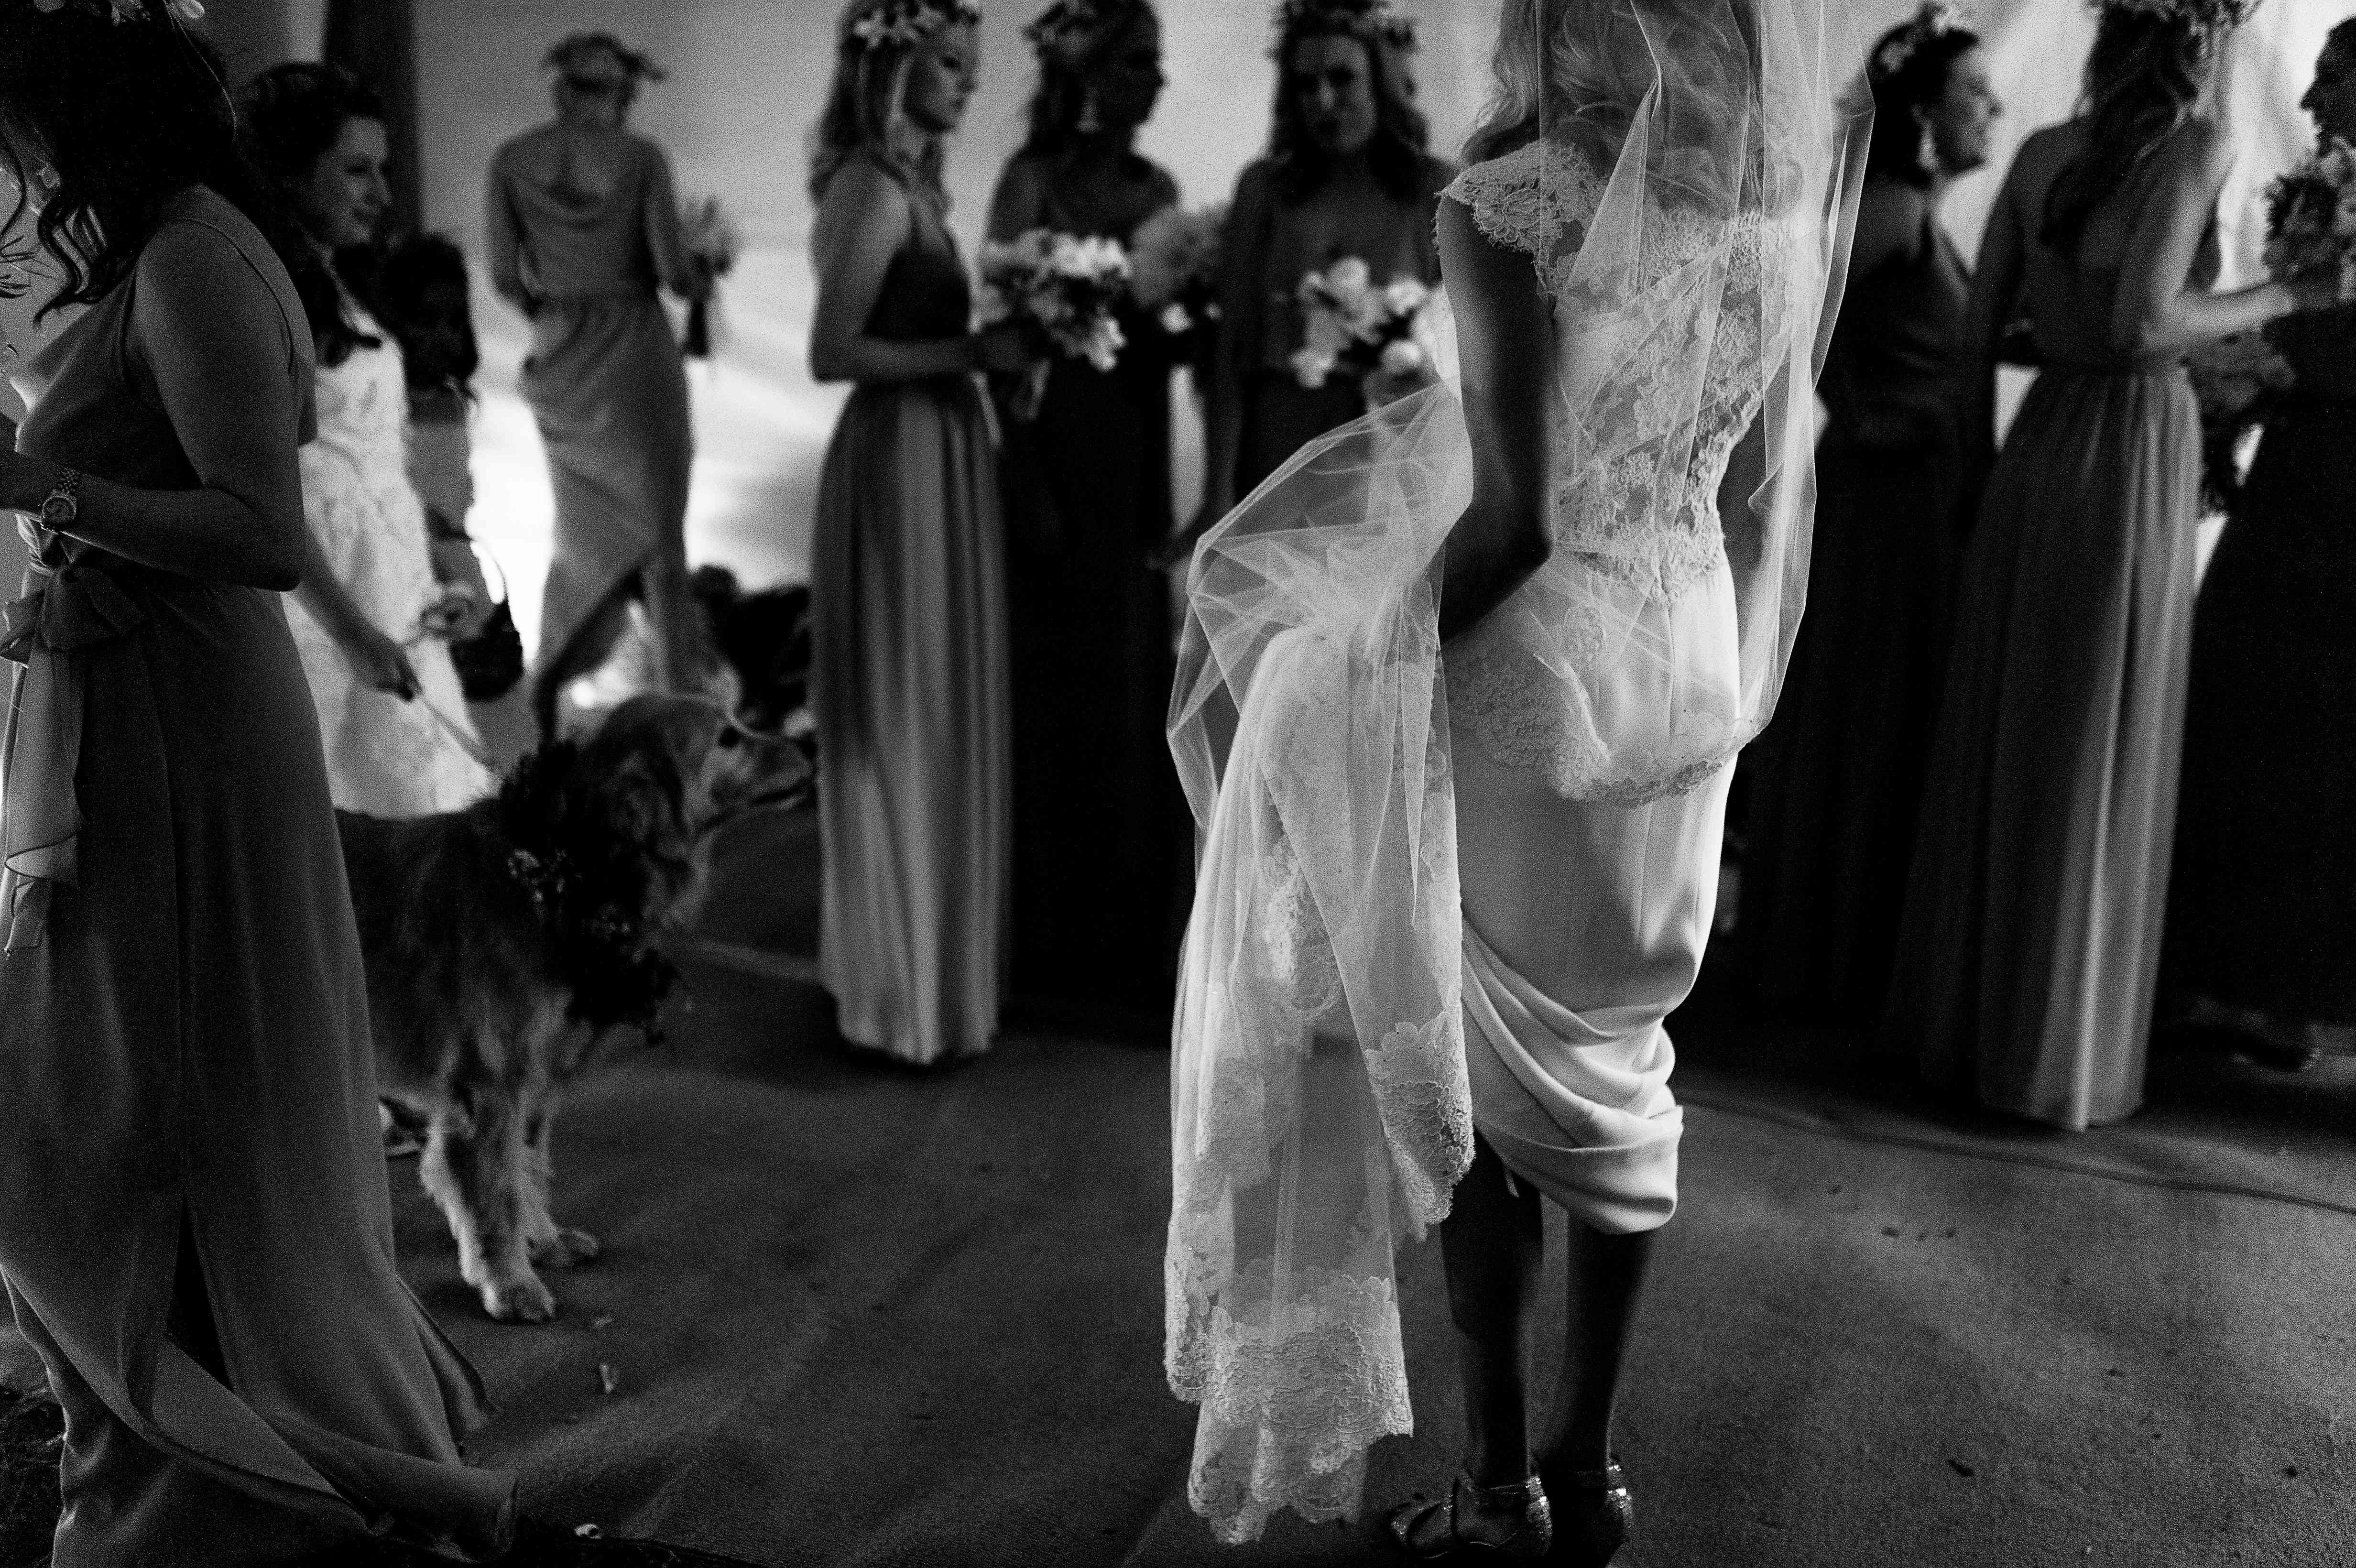 Bride holding train